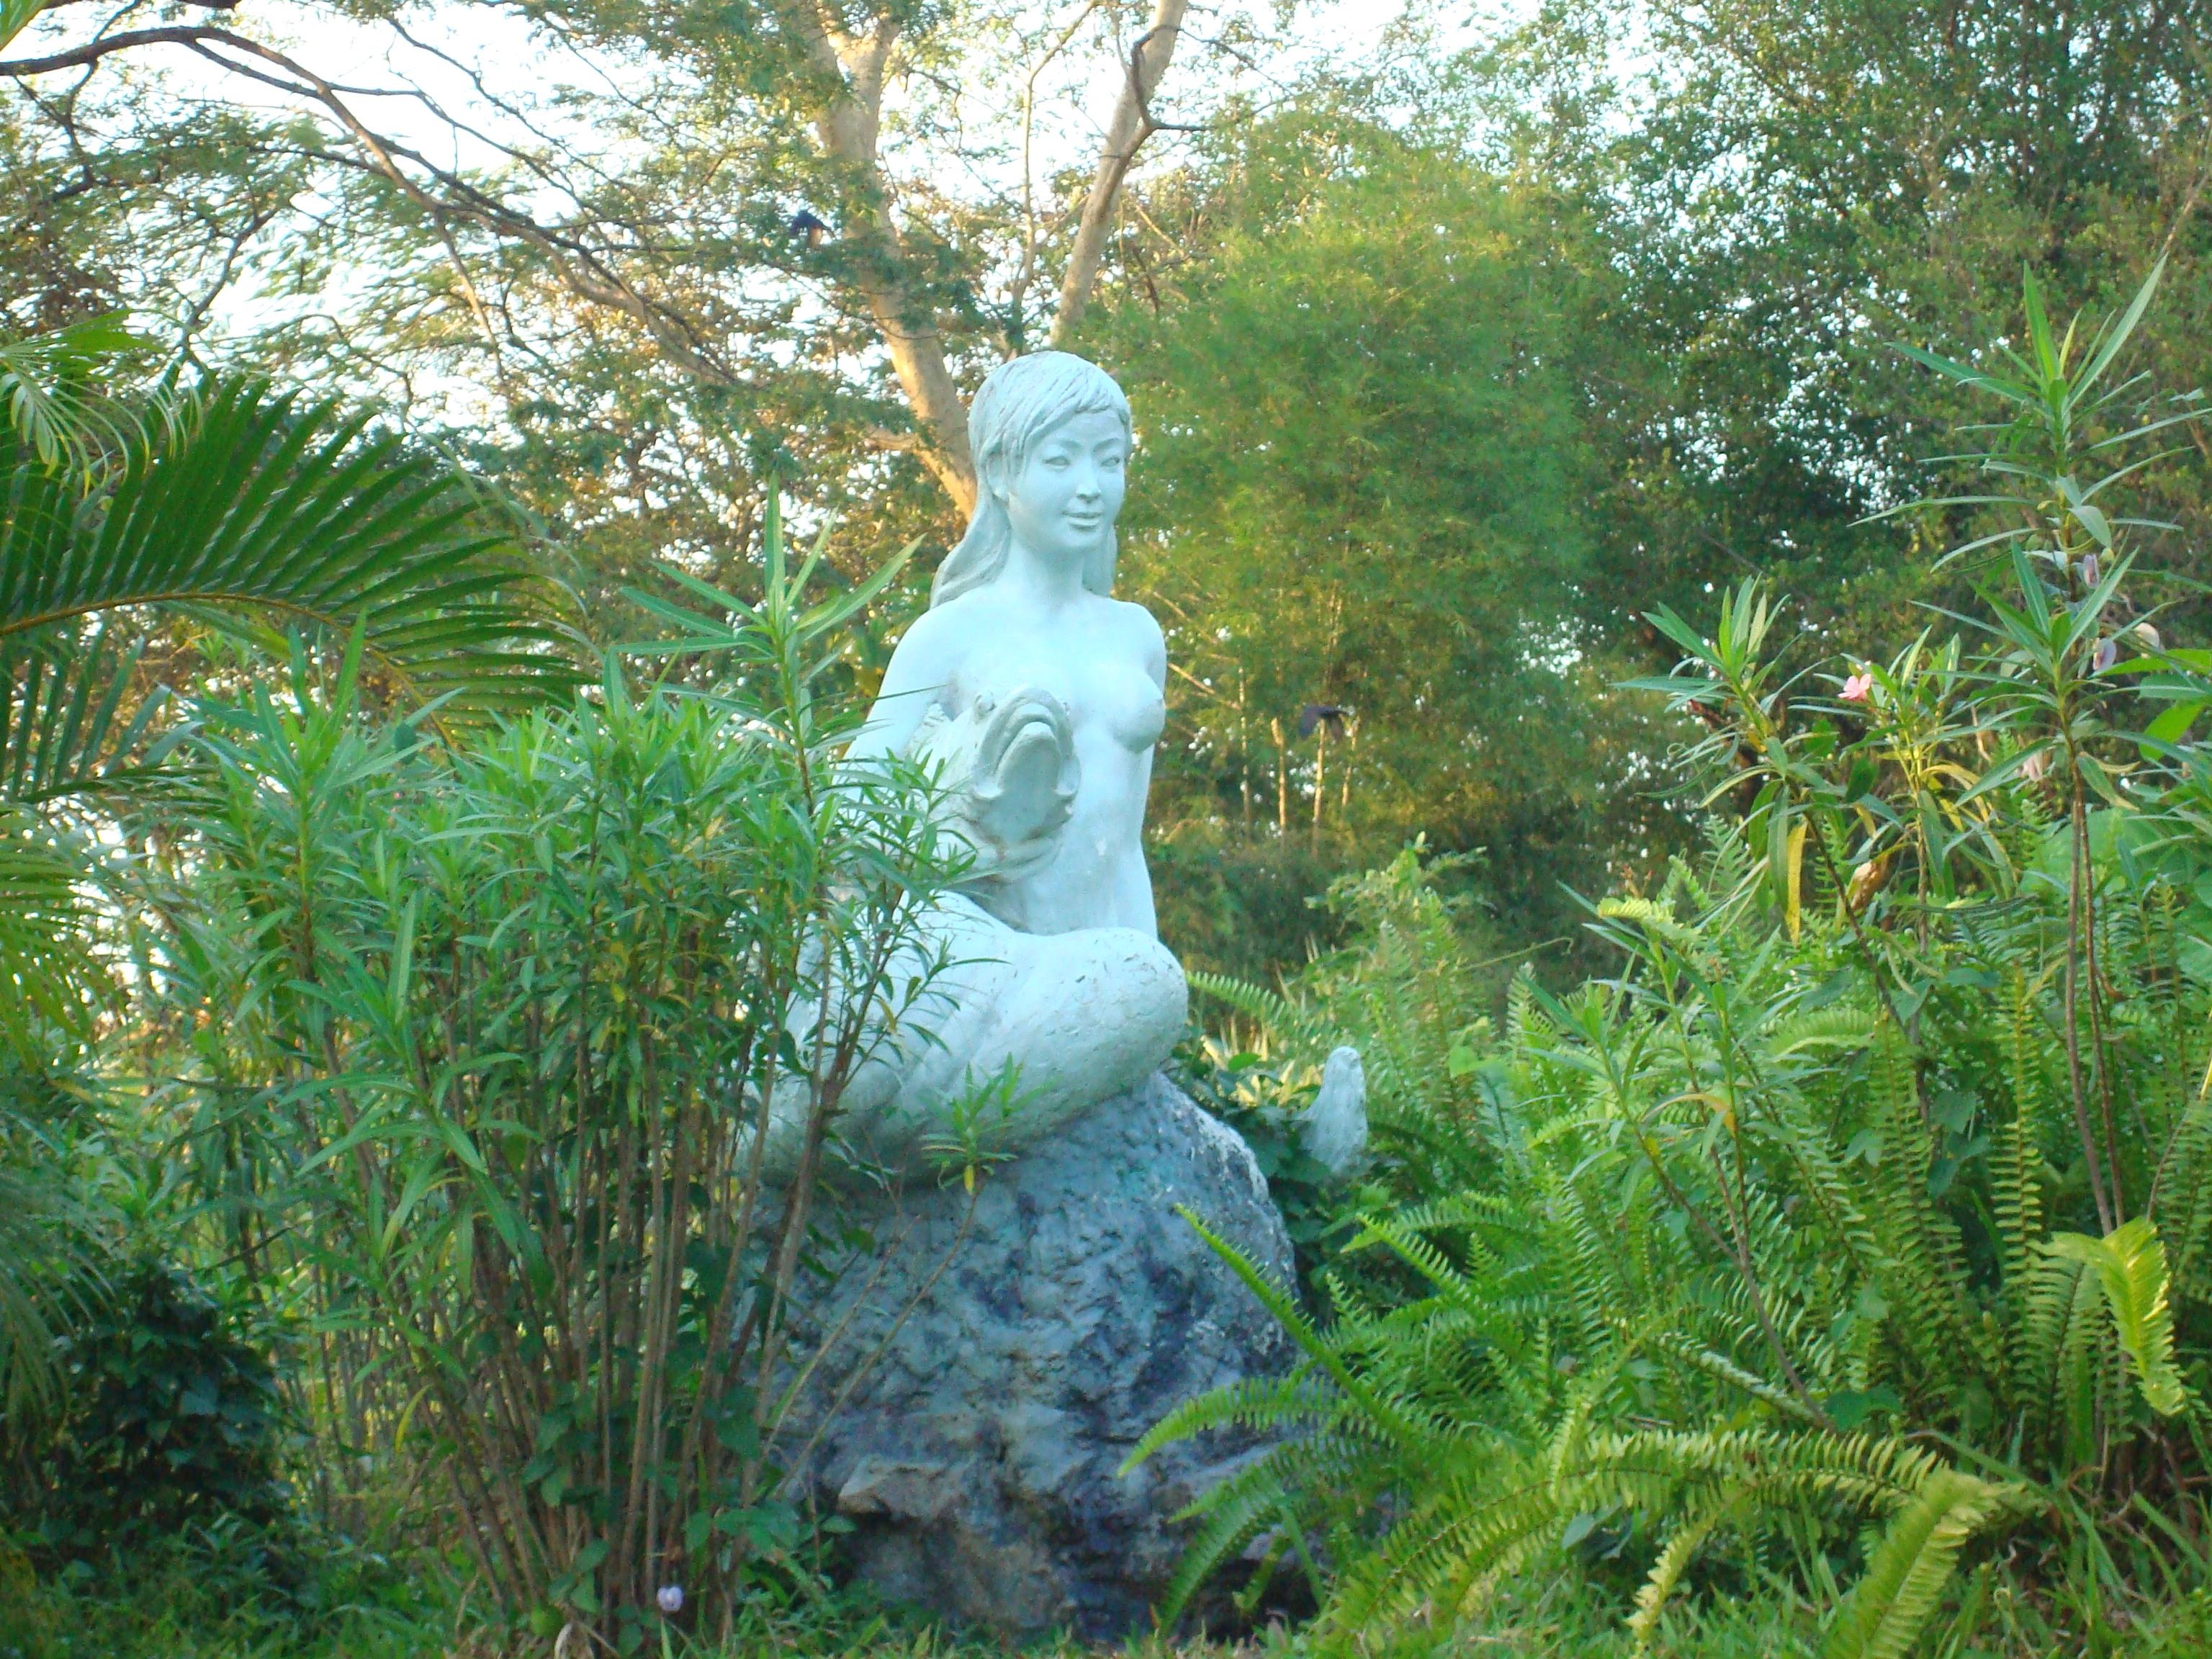 High Quality File:Mermaid Statue At Kandawgyi Garden.JPG